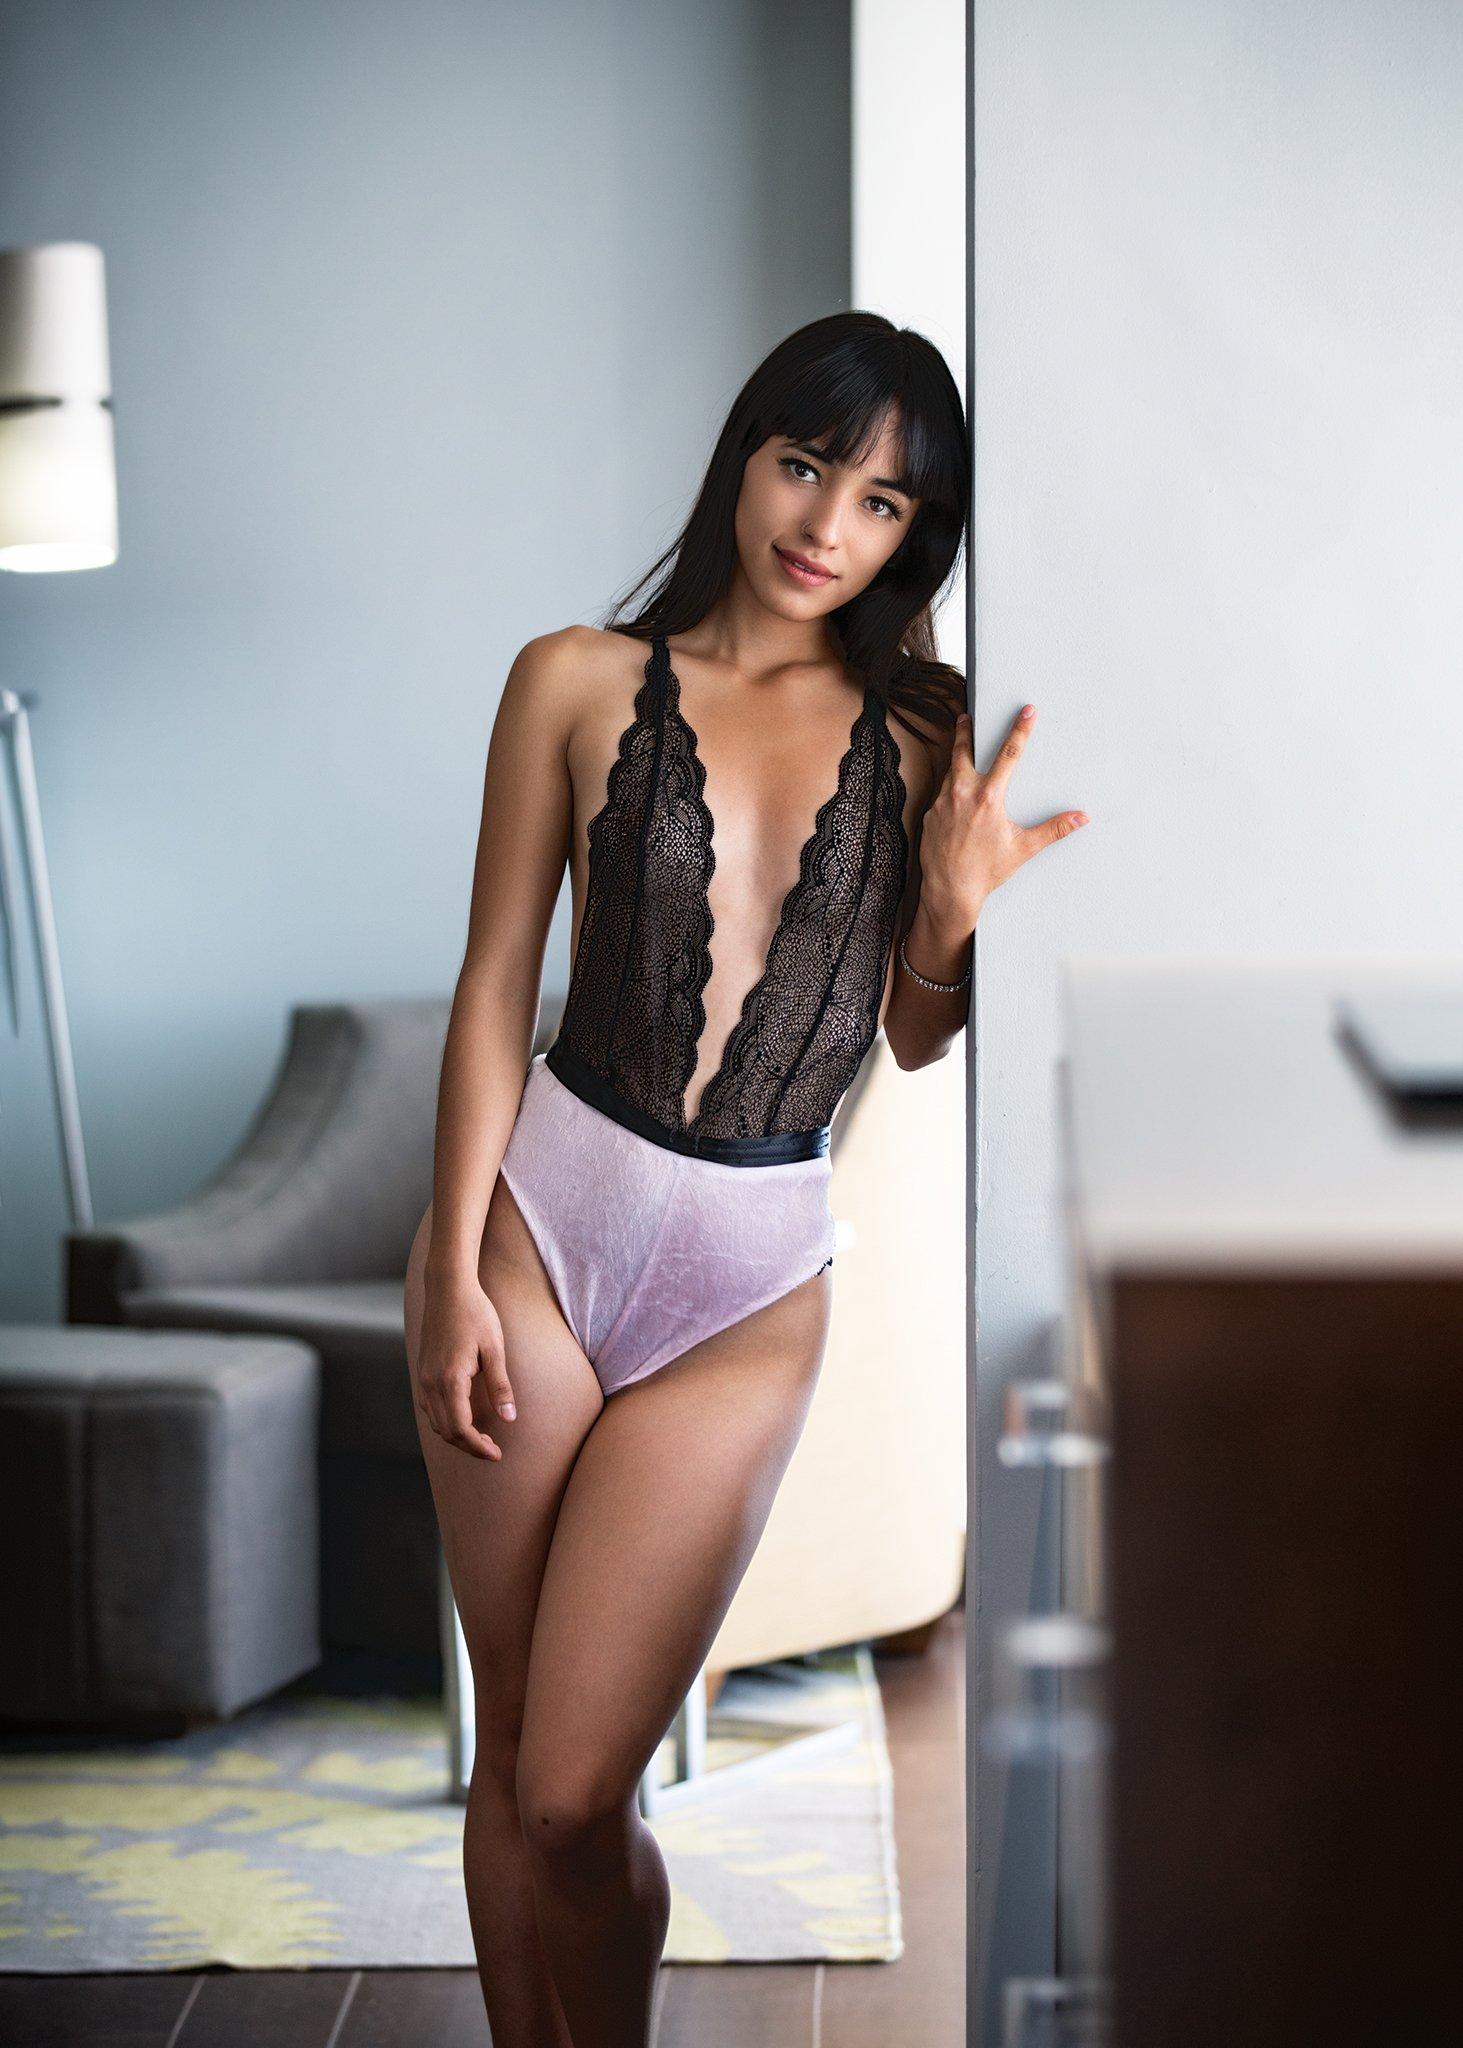 sexy, latín, lingerie, fitness, portrait, model, Luis Gastón